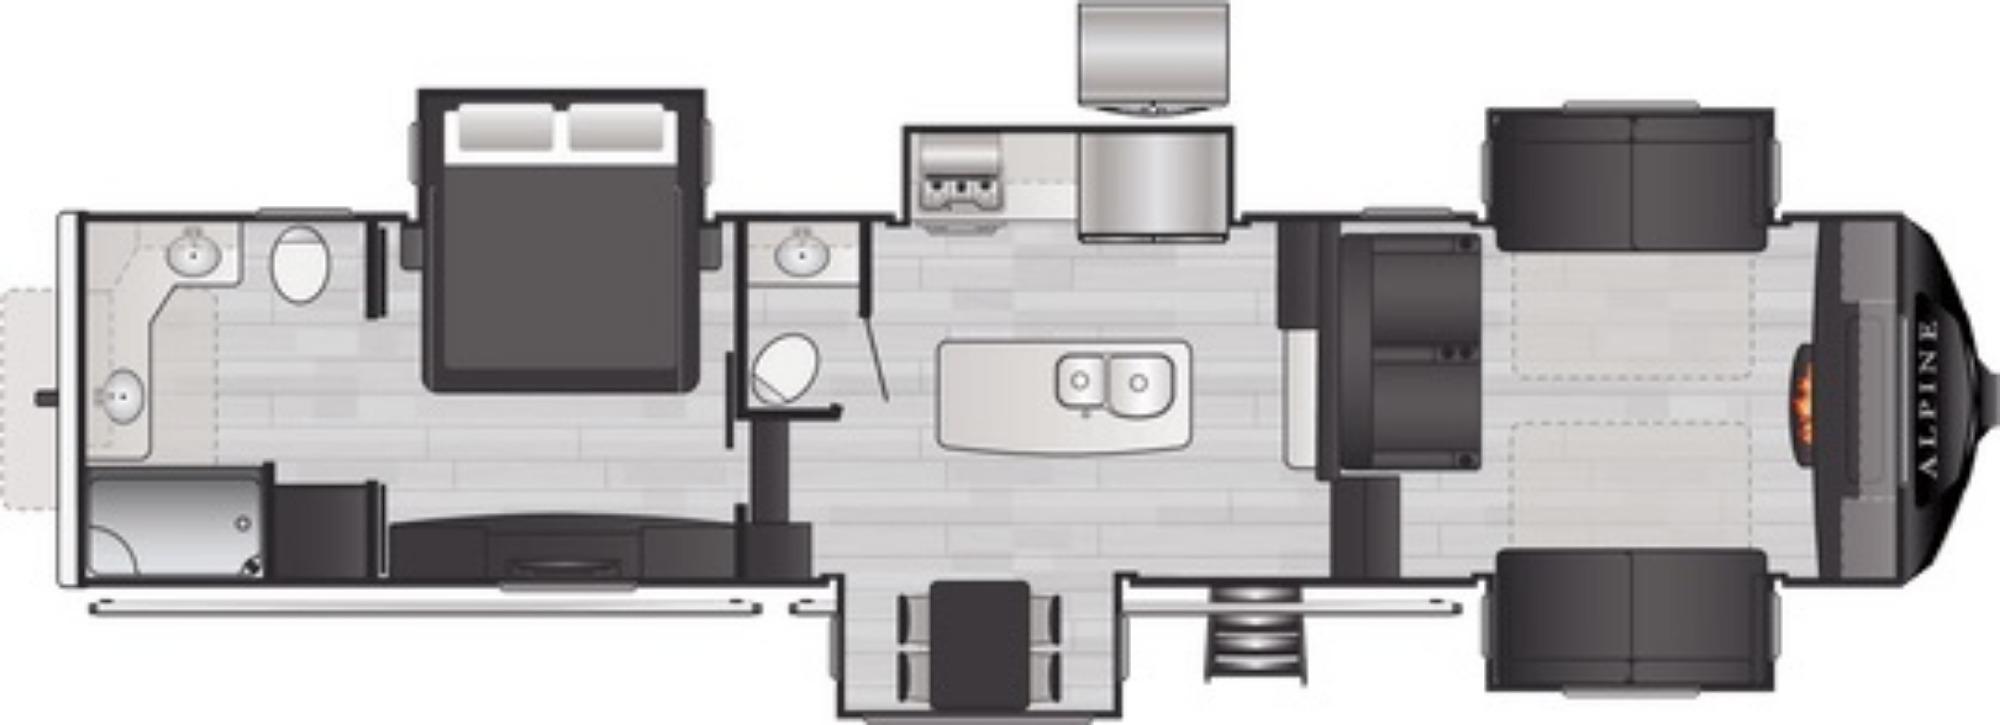 View Floor Plan for 2021 KEYSTONE ALPINE 3700FL